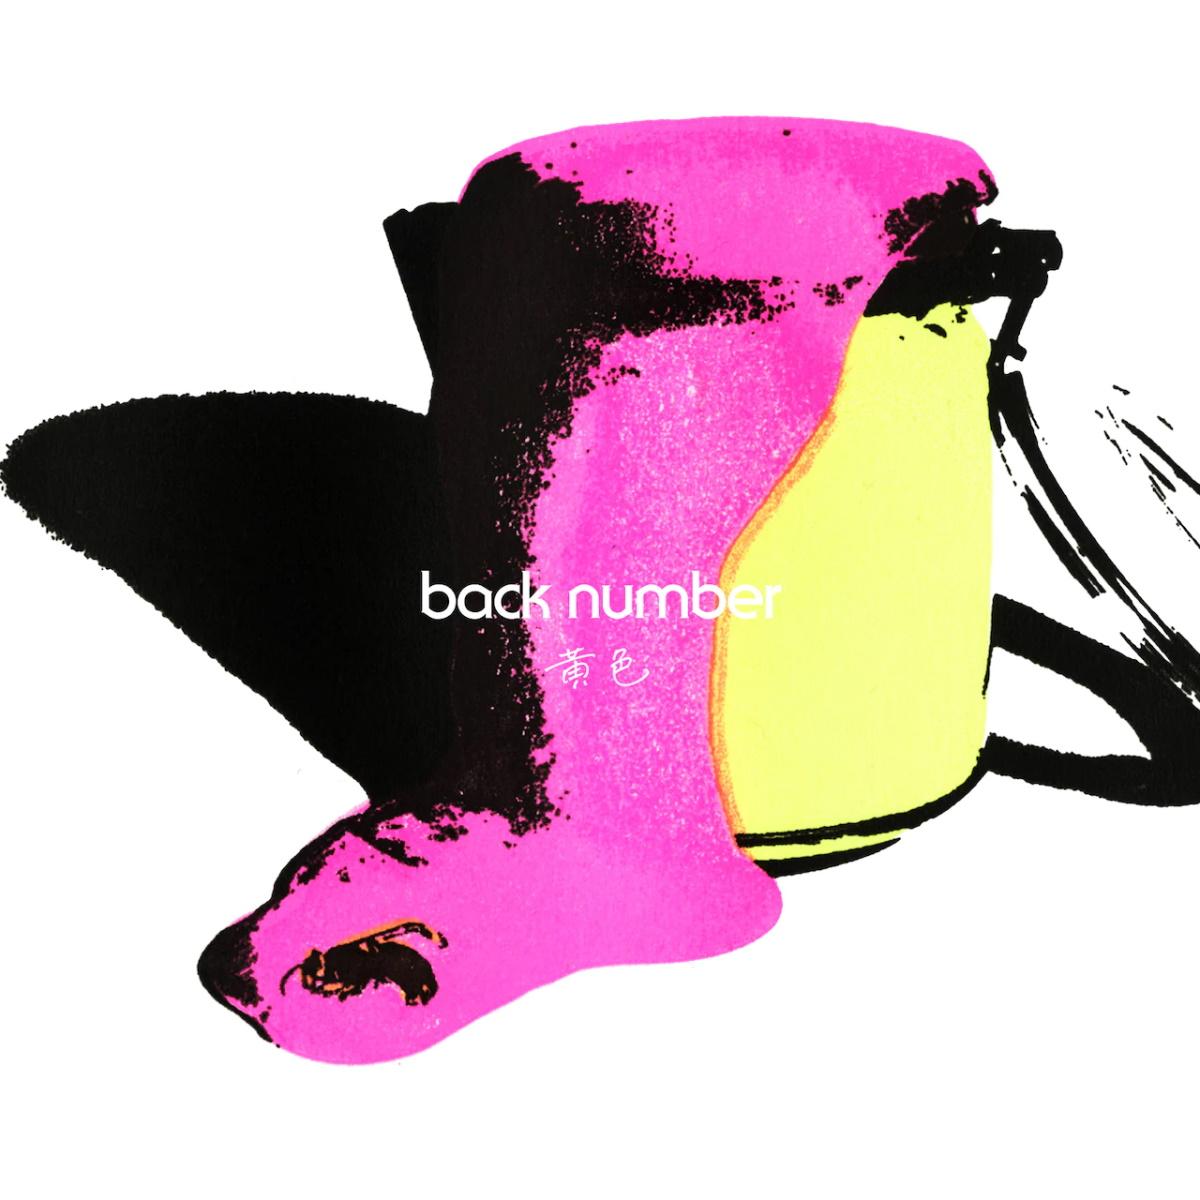 『back number - 勝手にオリンピック』収録の『黄色』ジャケット